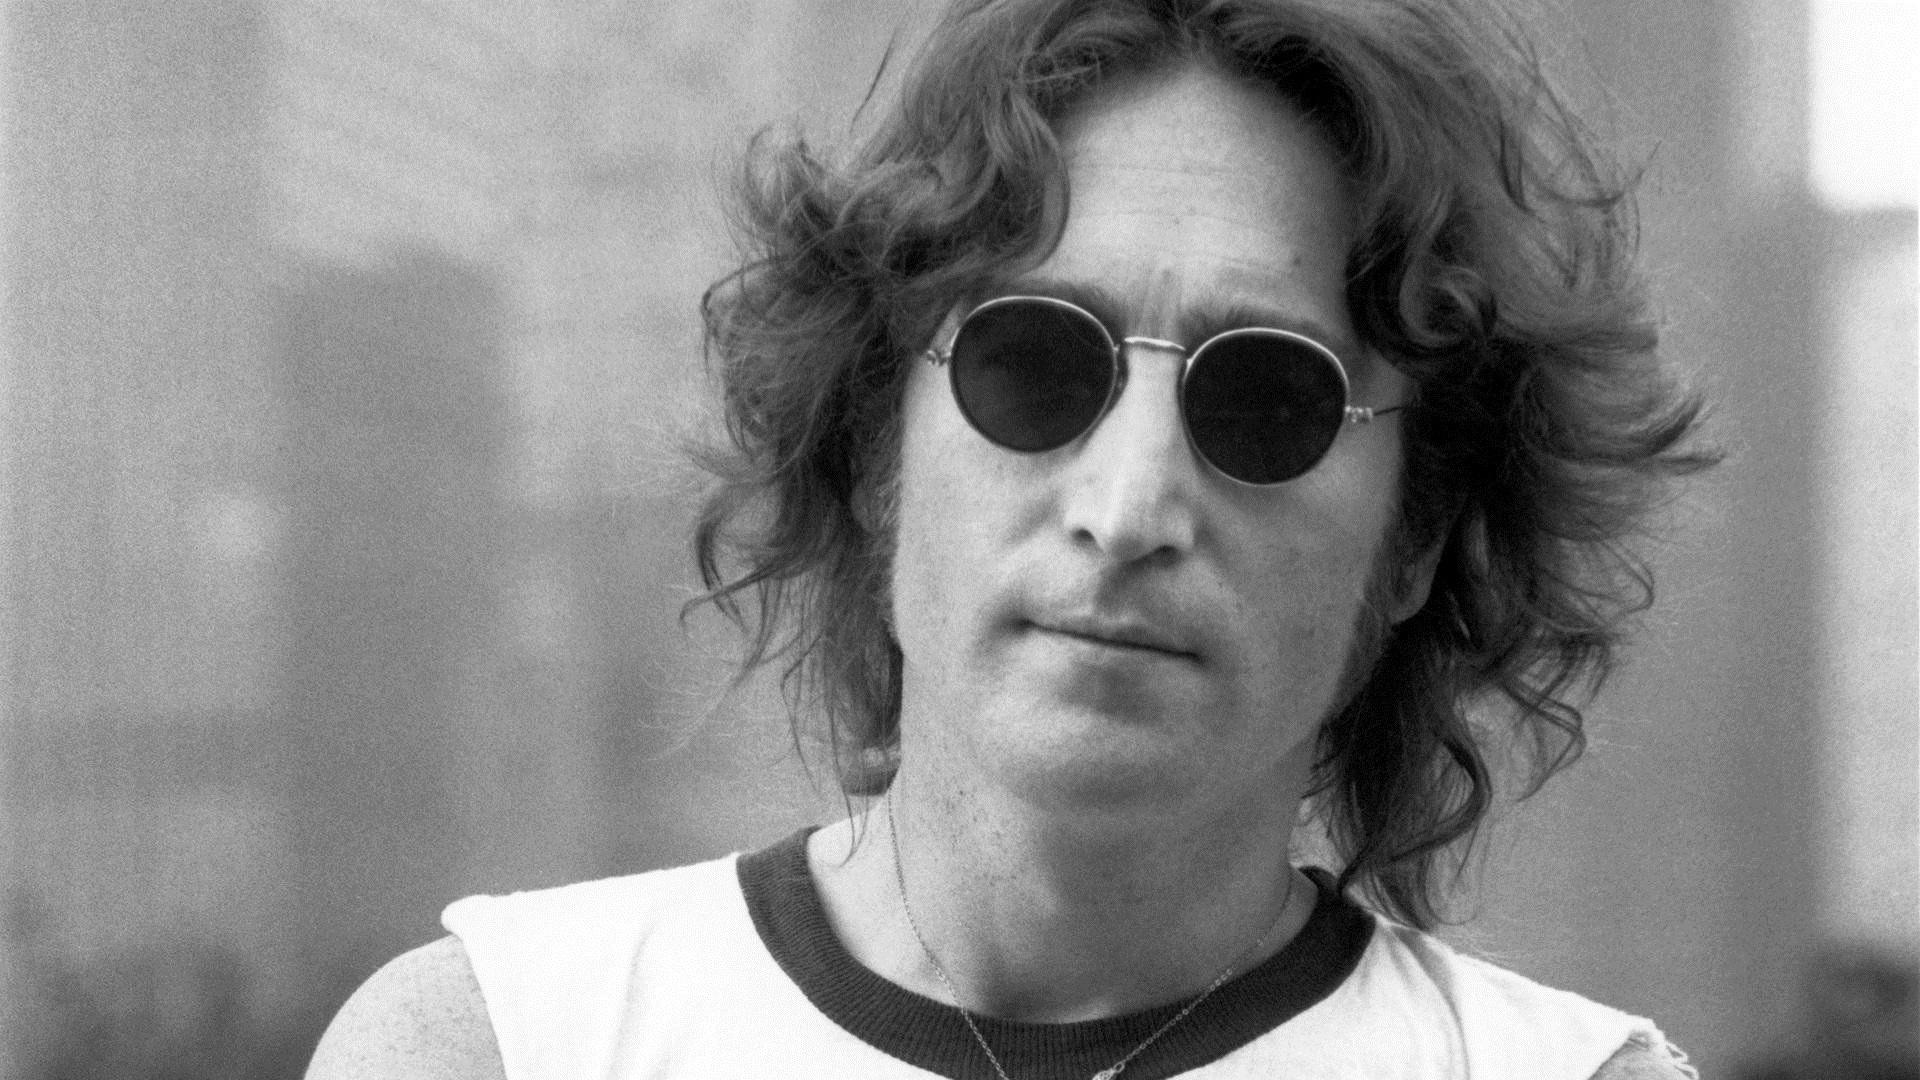 John Lennon free hd wallpaper